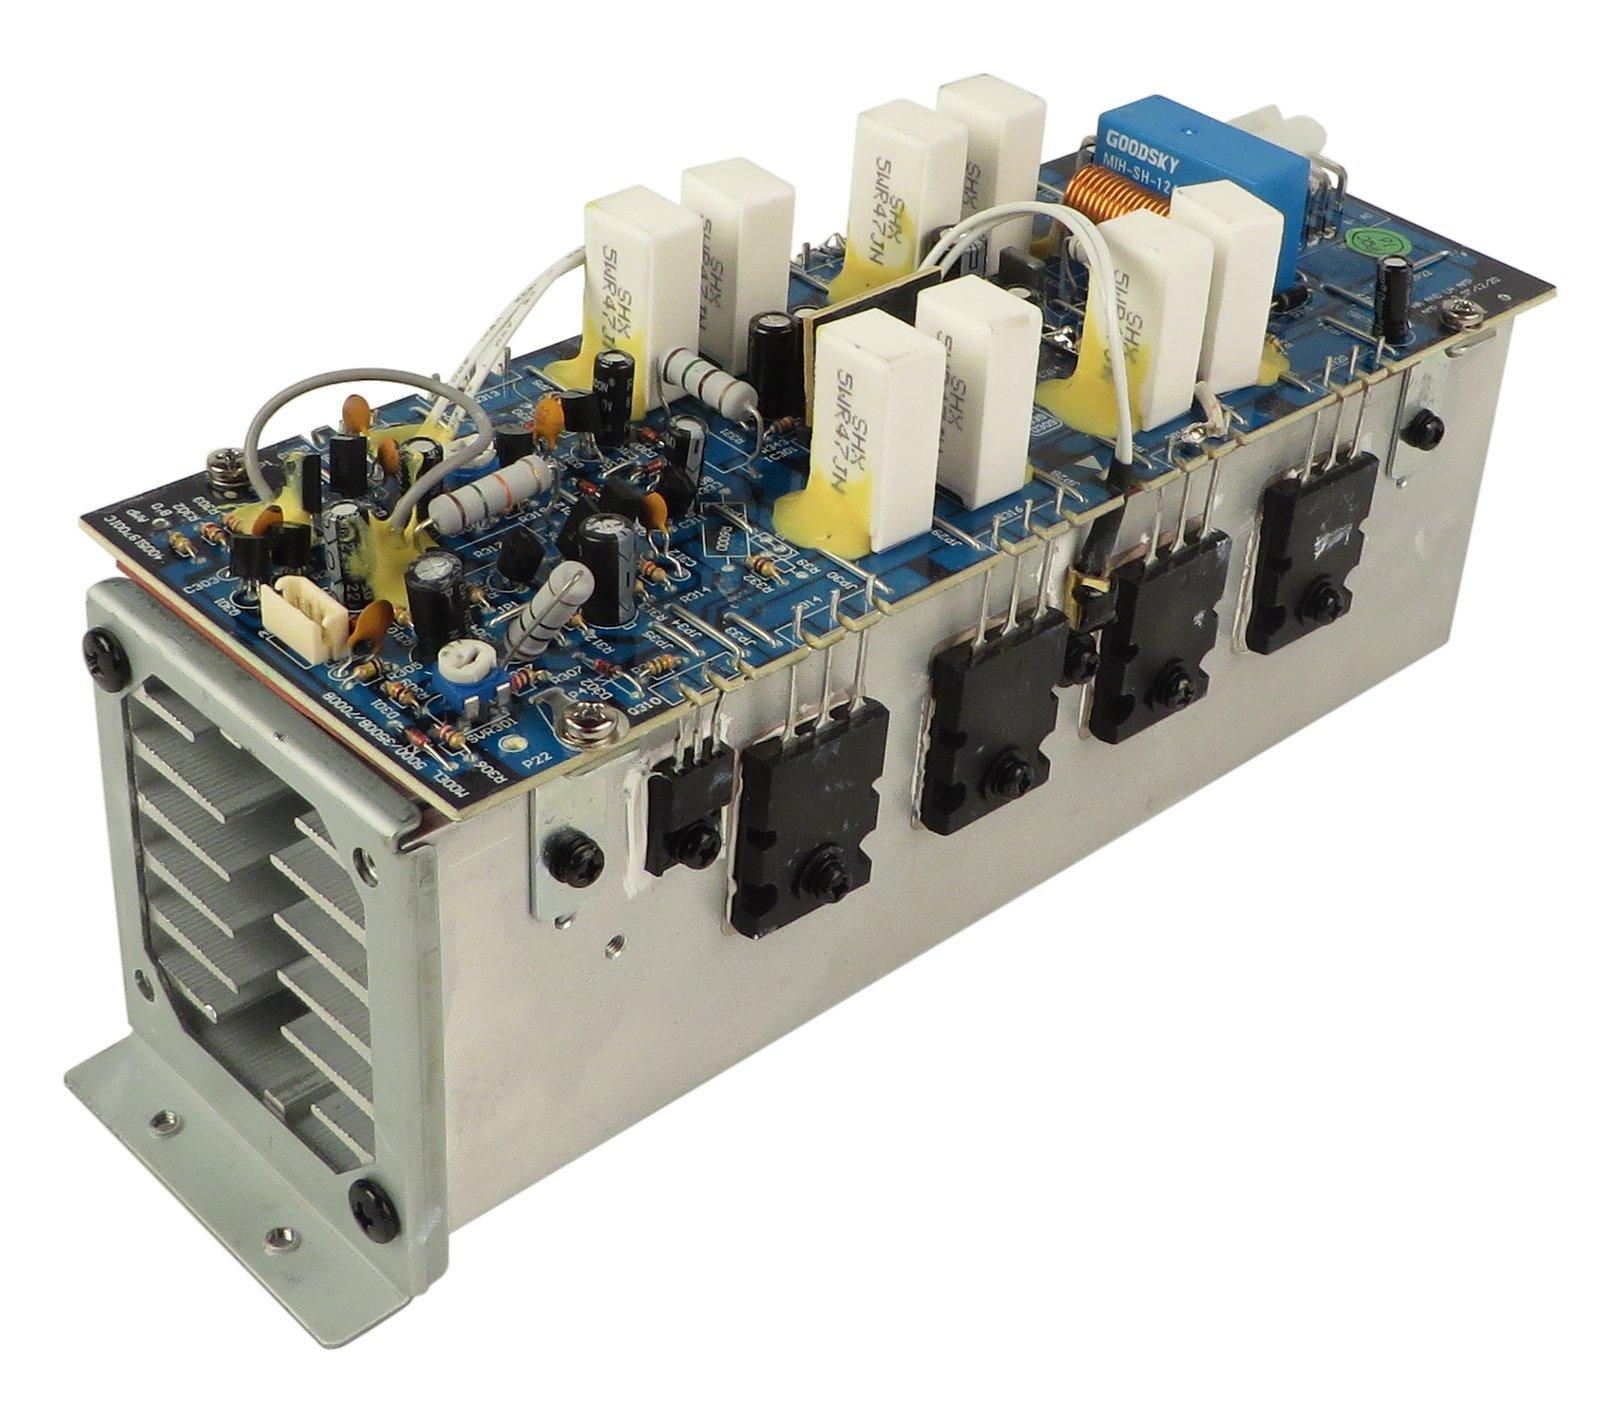 Amp PCB Assembly for HA3500